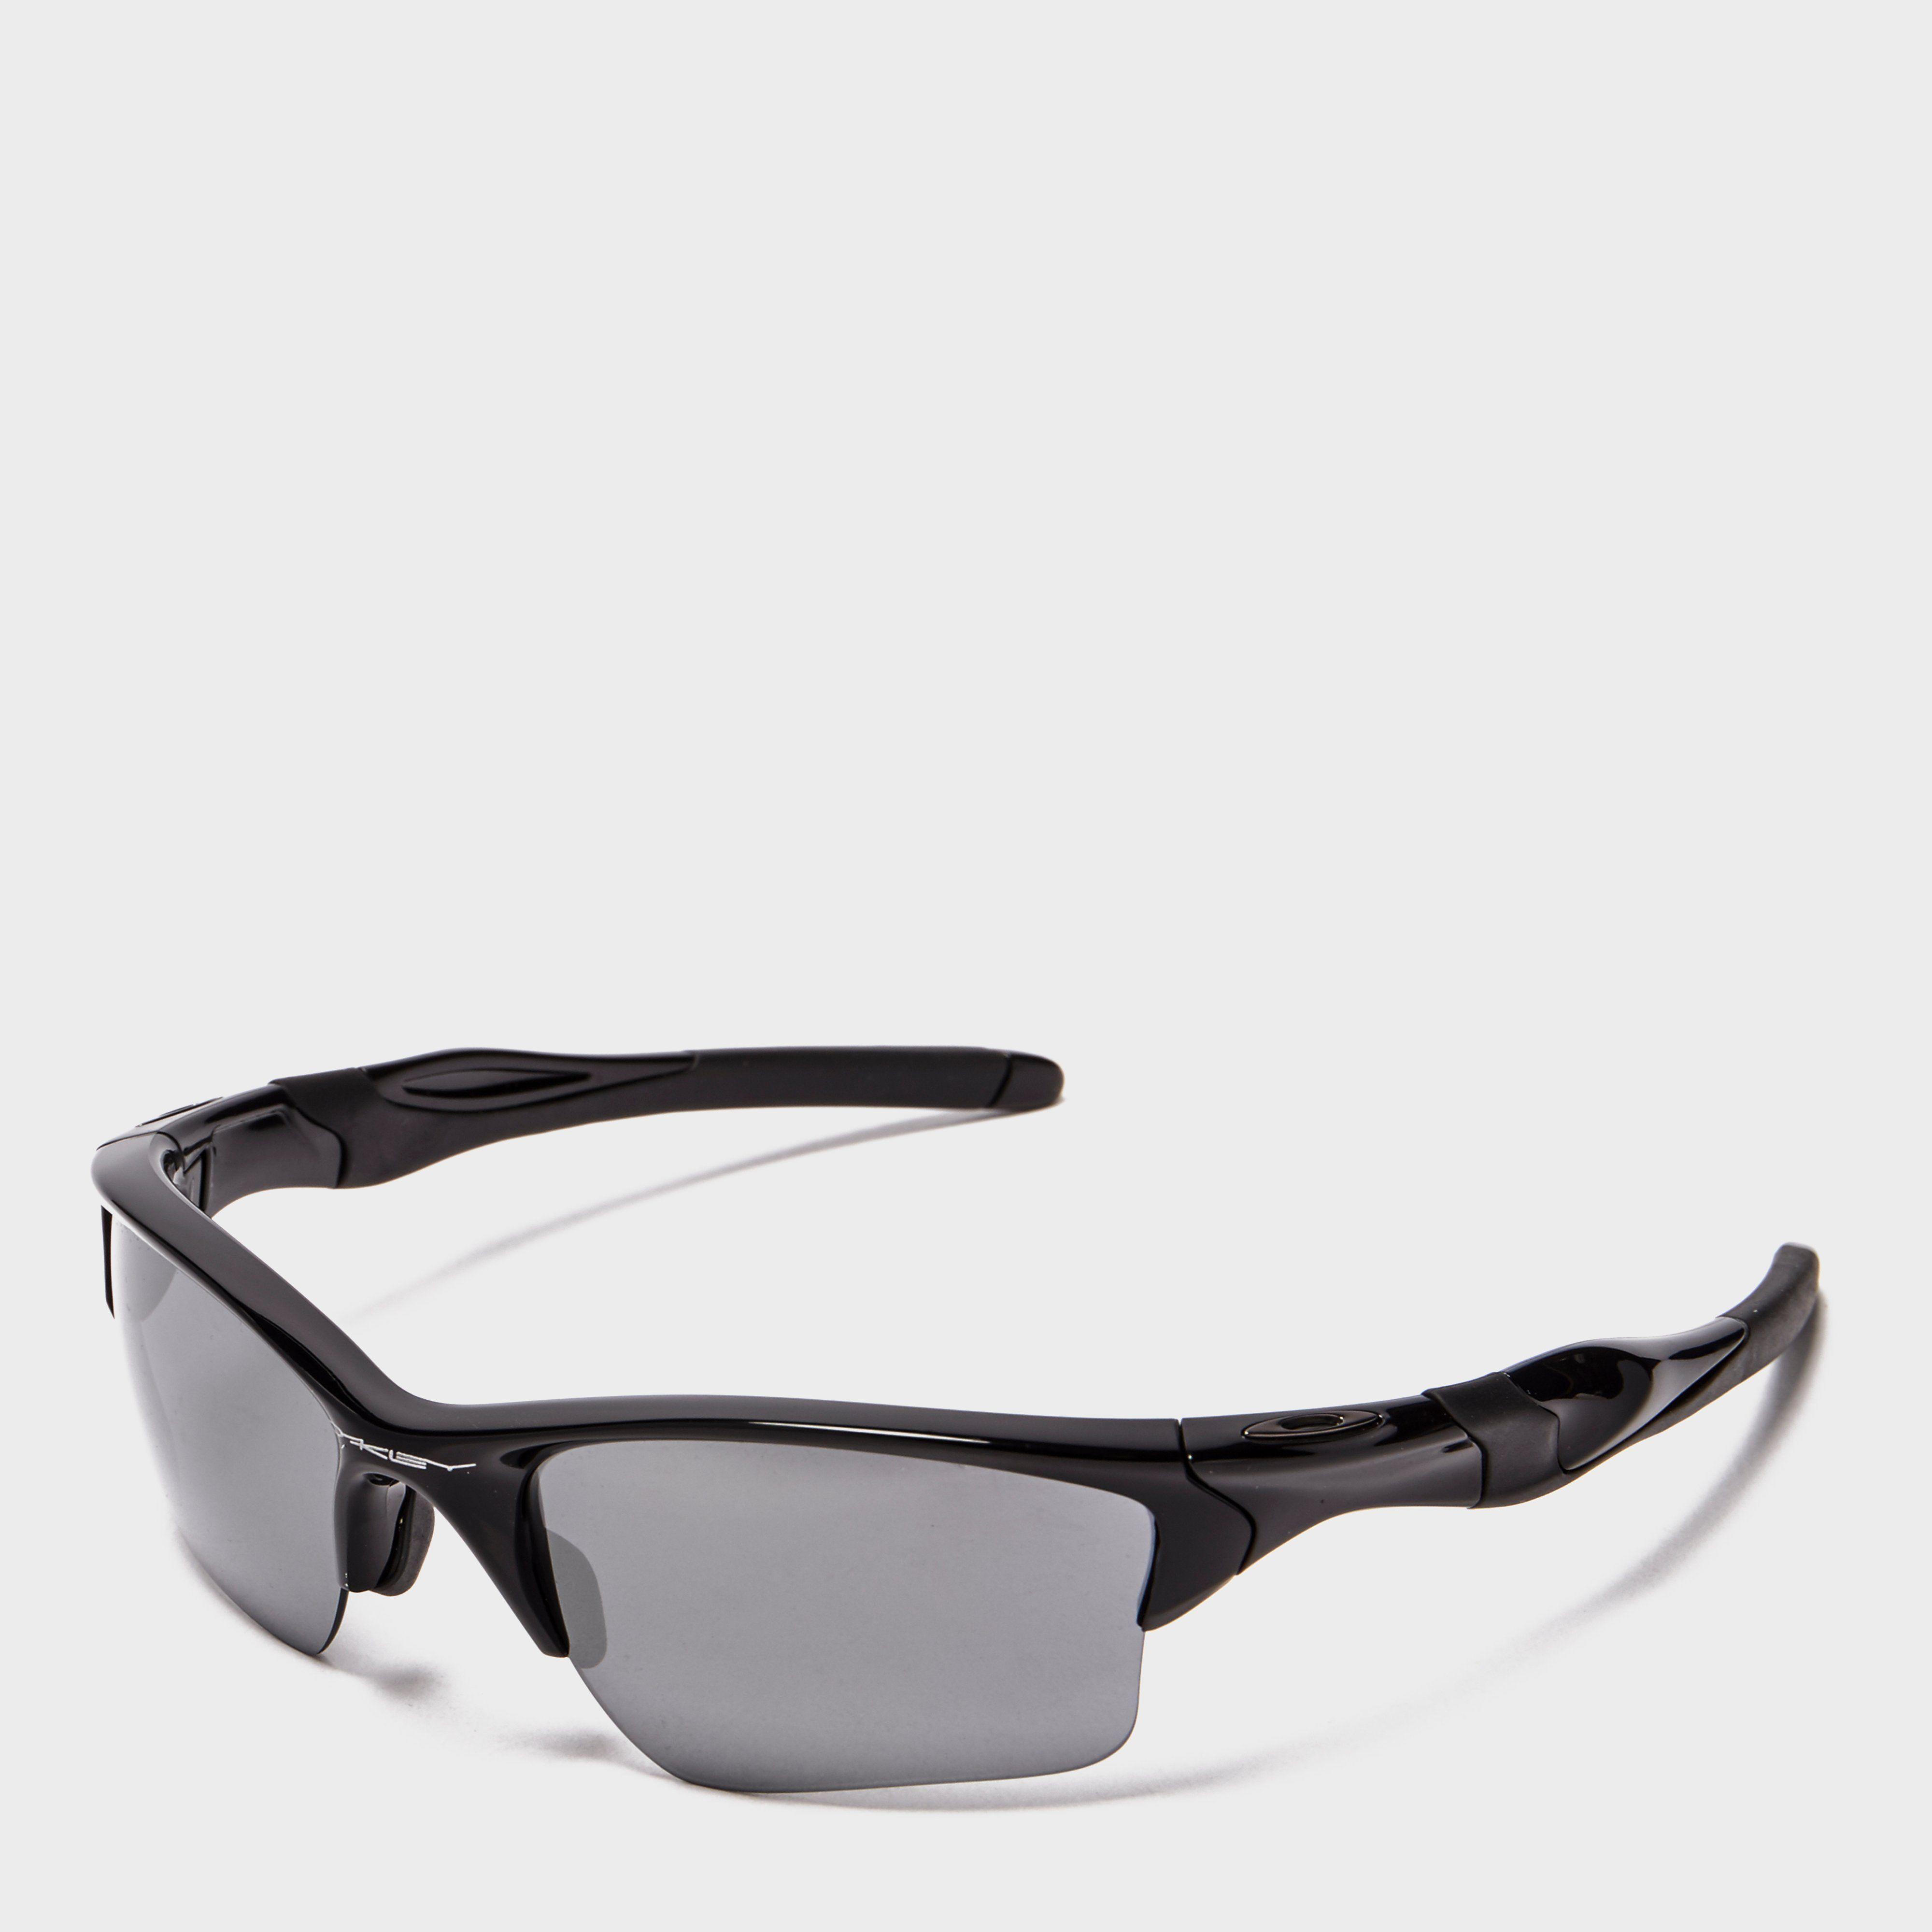 OAKLEY Half Jacket® 2.0XL Black Iridium Sunglasses